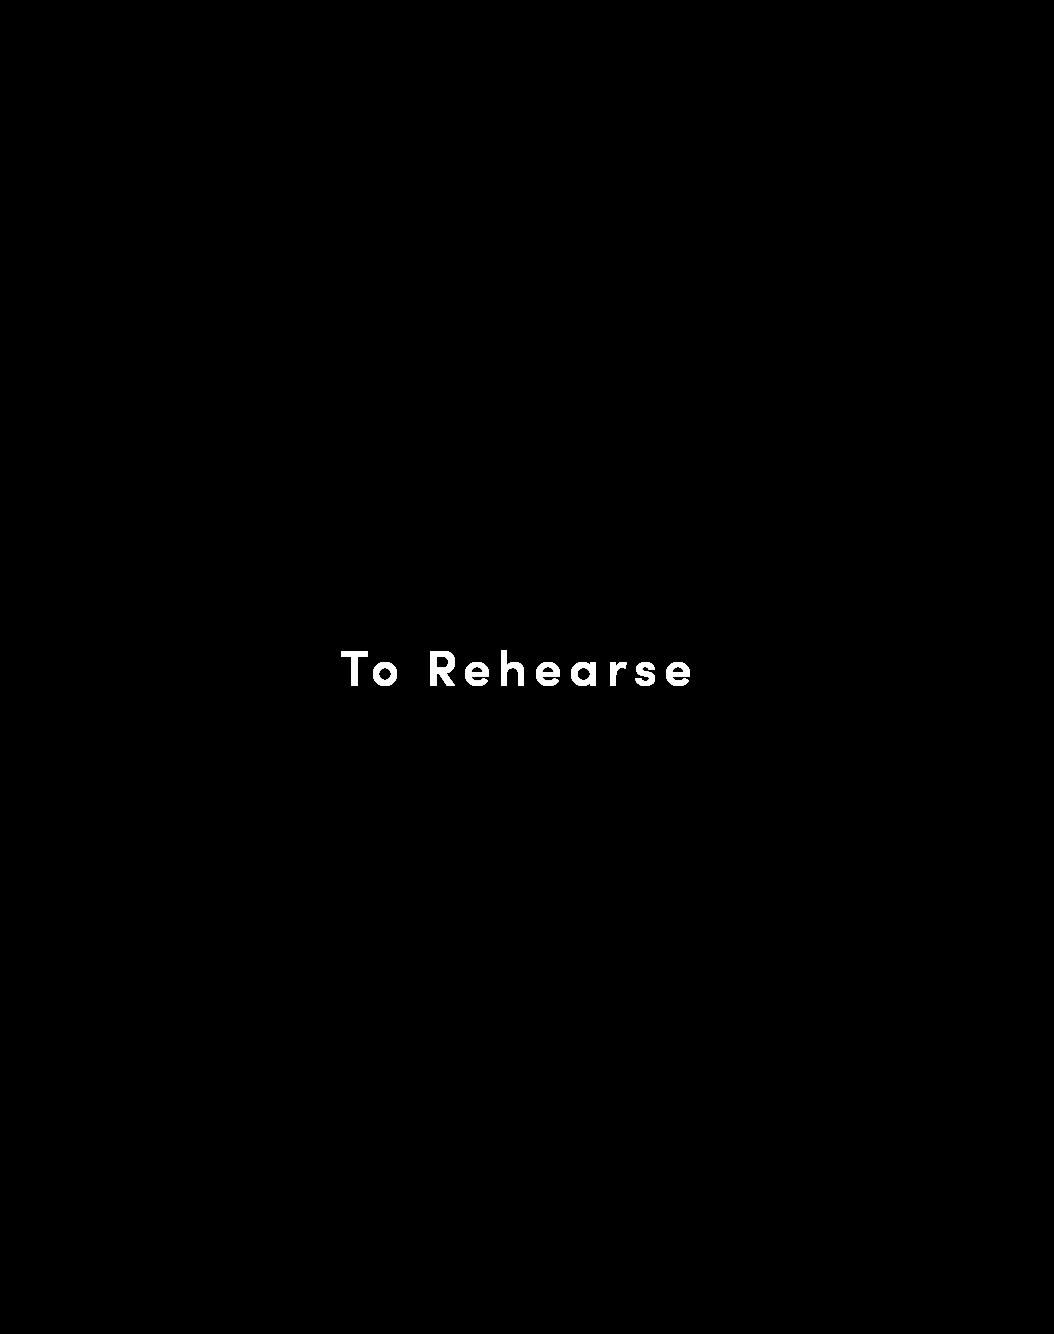 TO REHEARSE